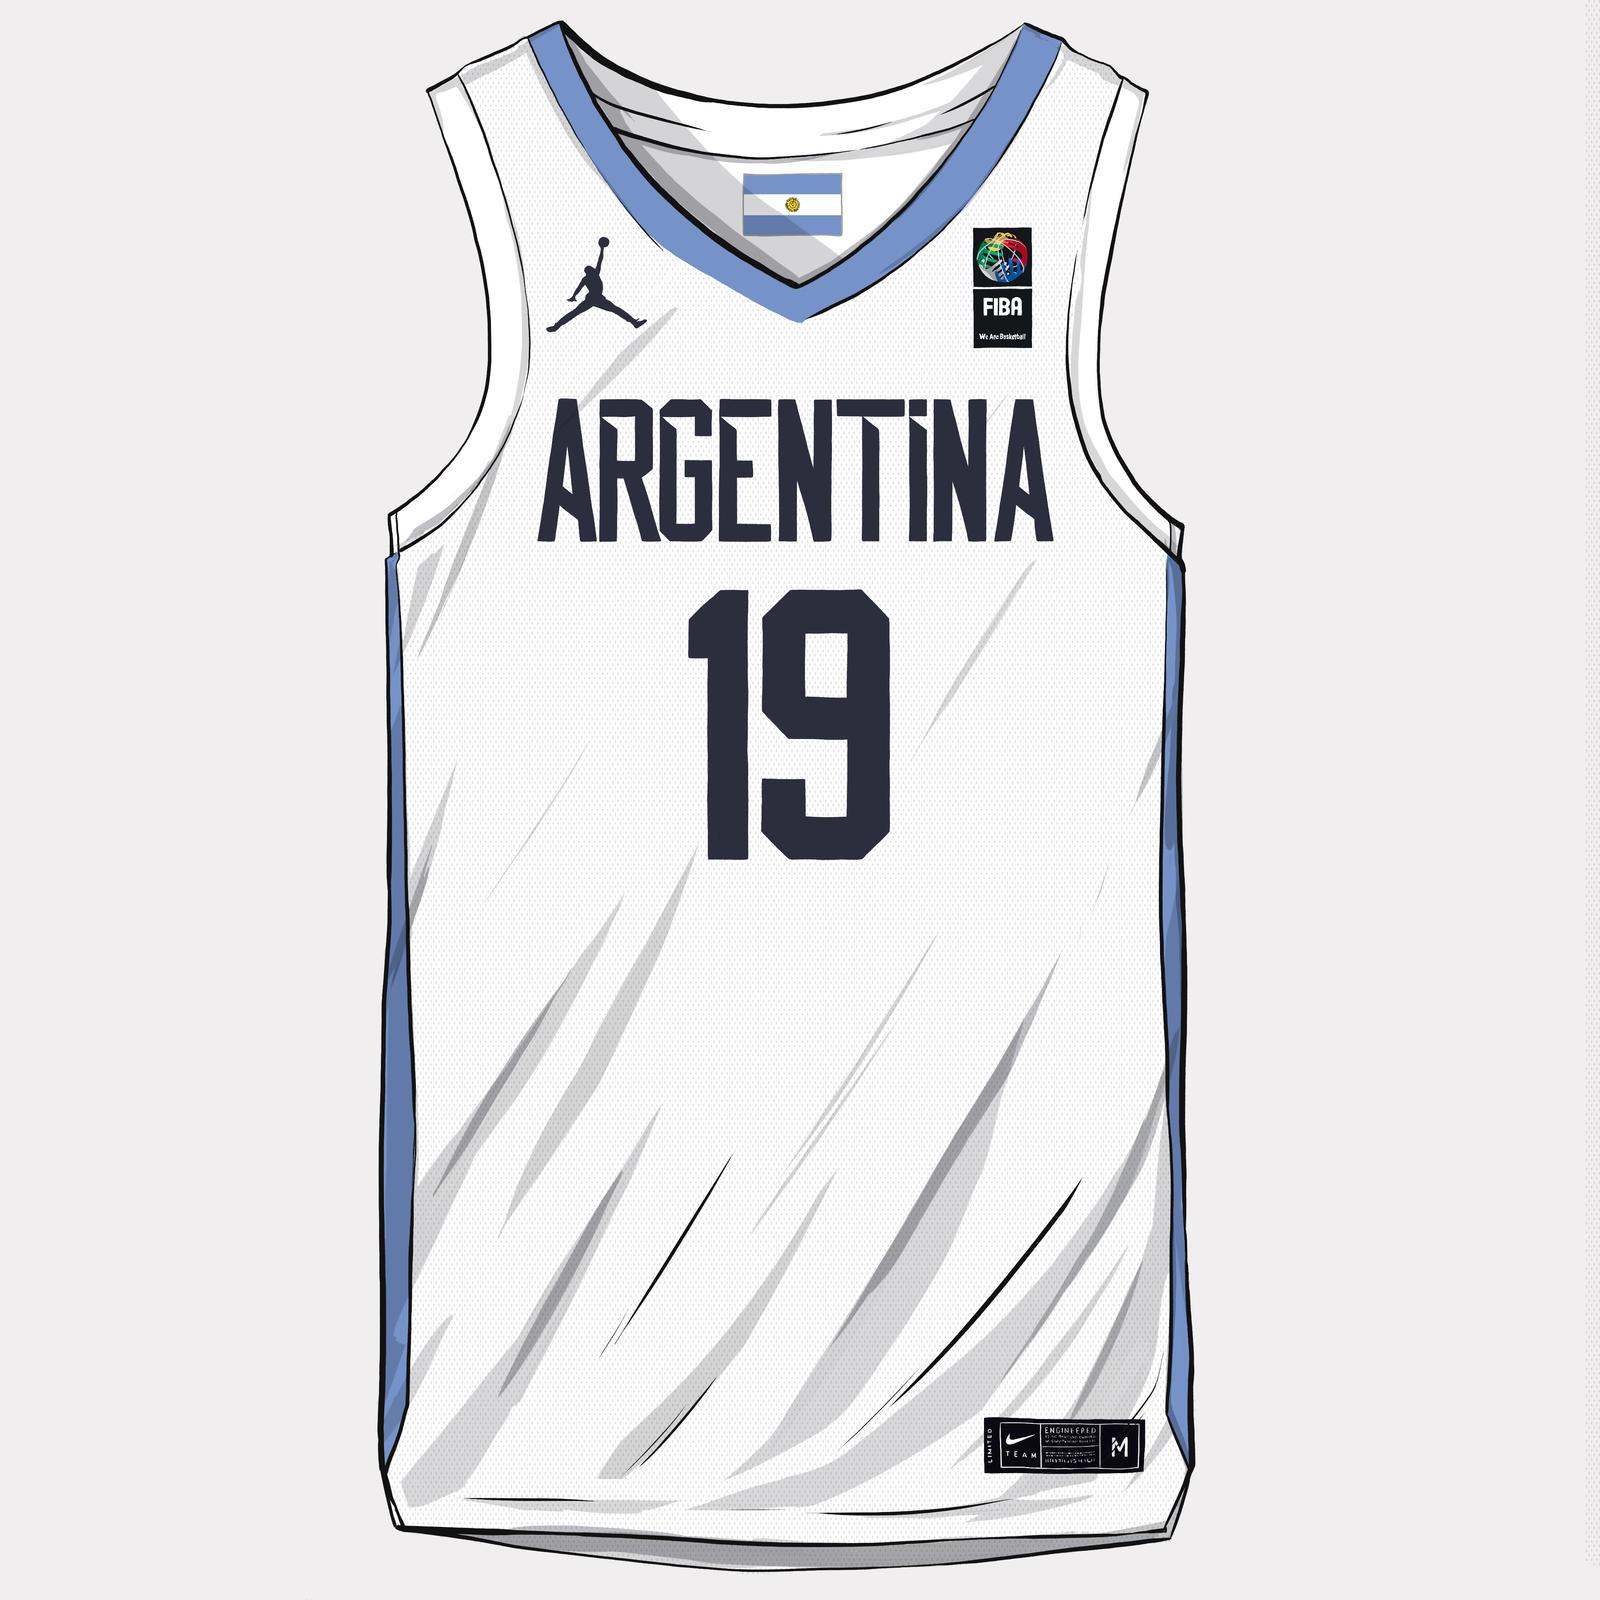 nike-news-argentina-national-team-kit-2019-illustration-1x1_2_89524.jpg